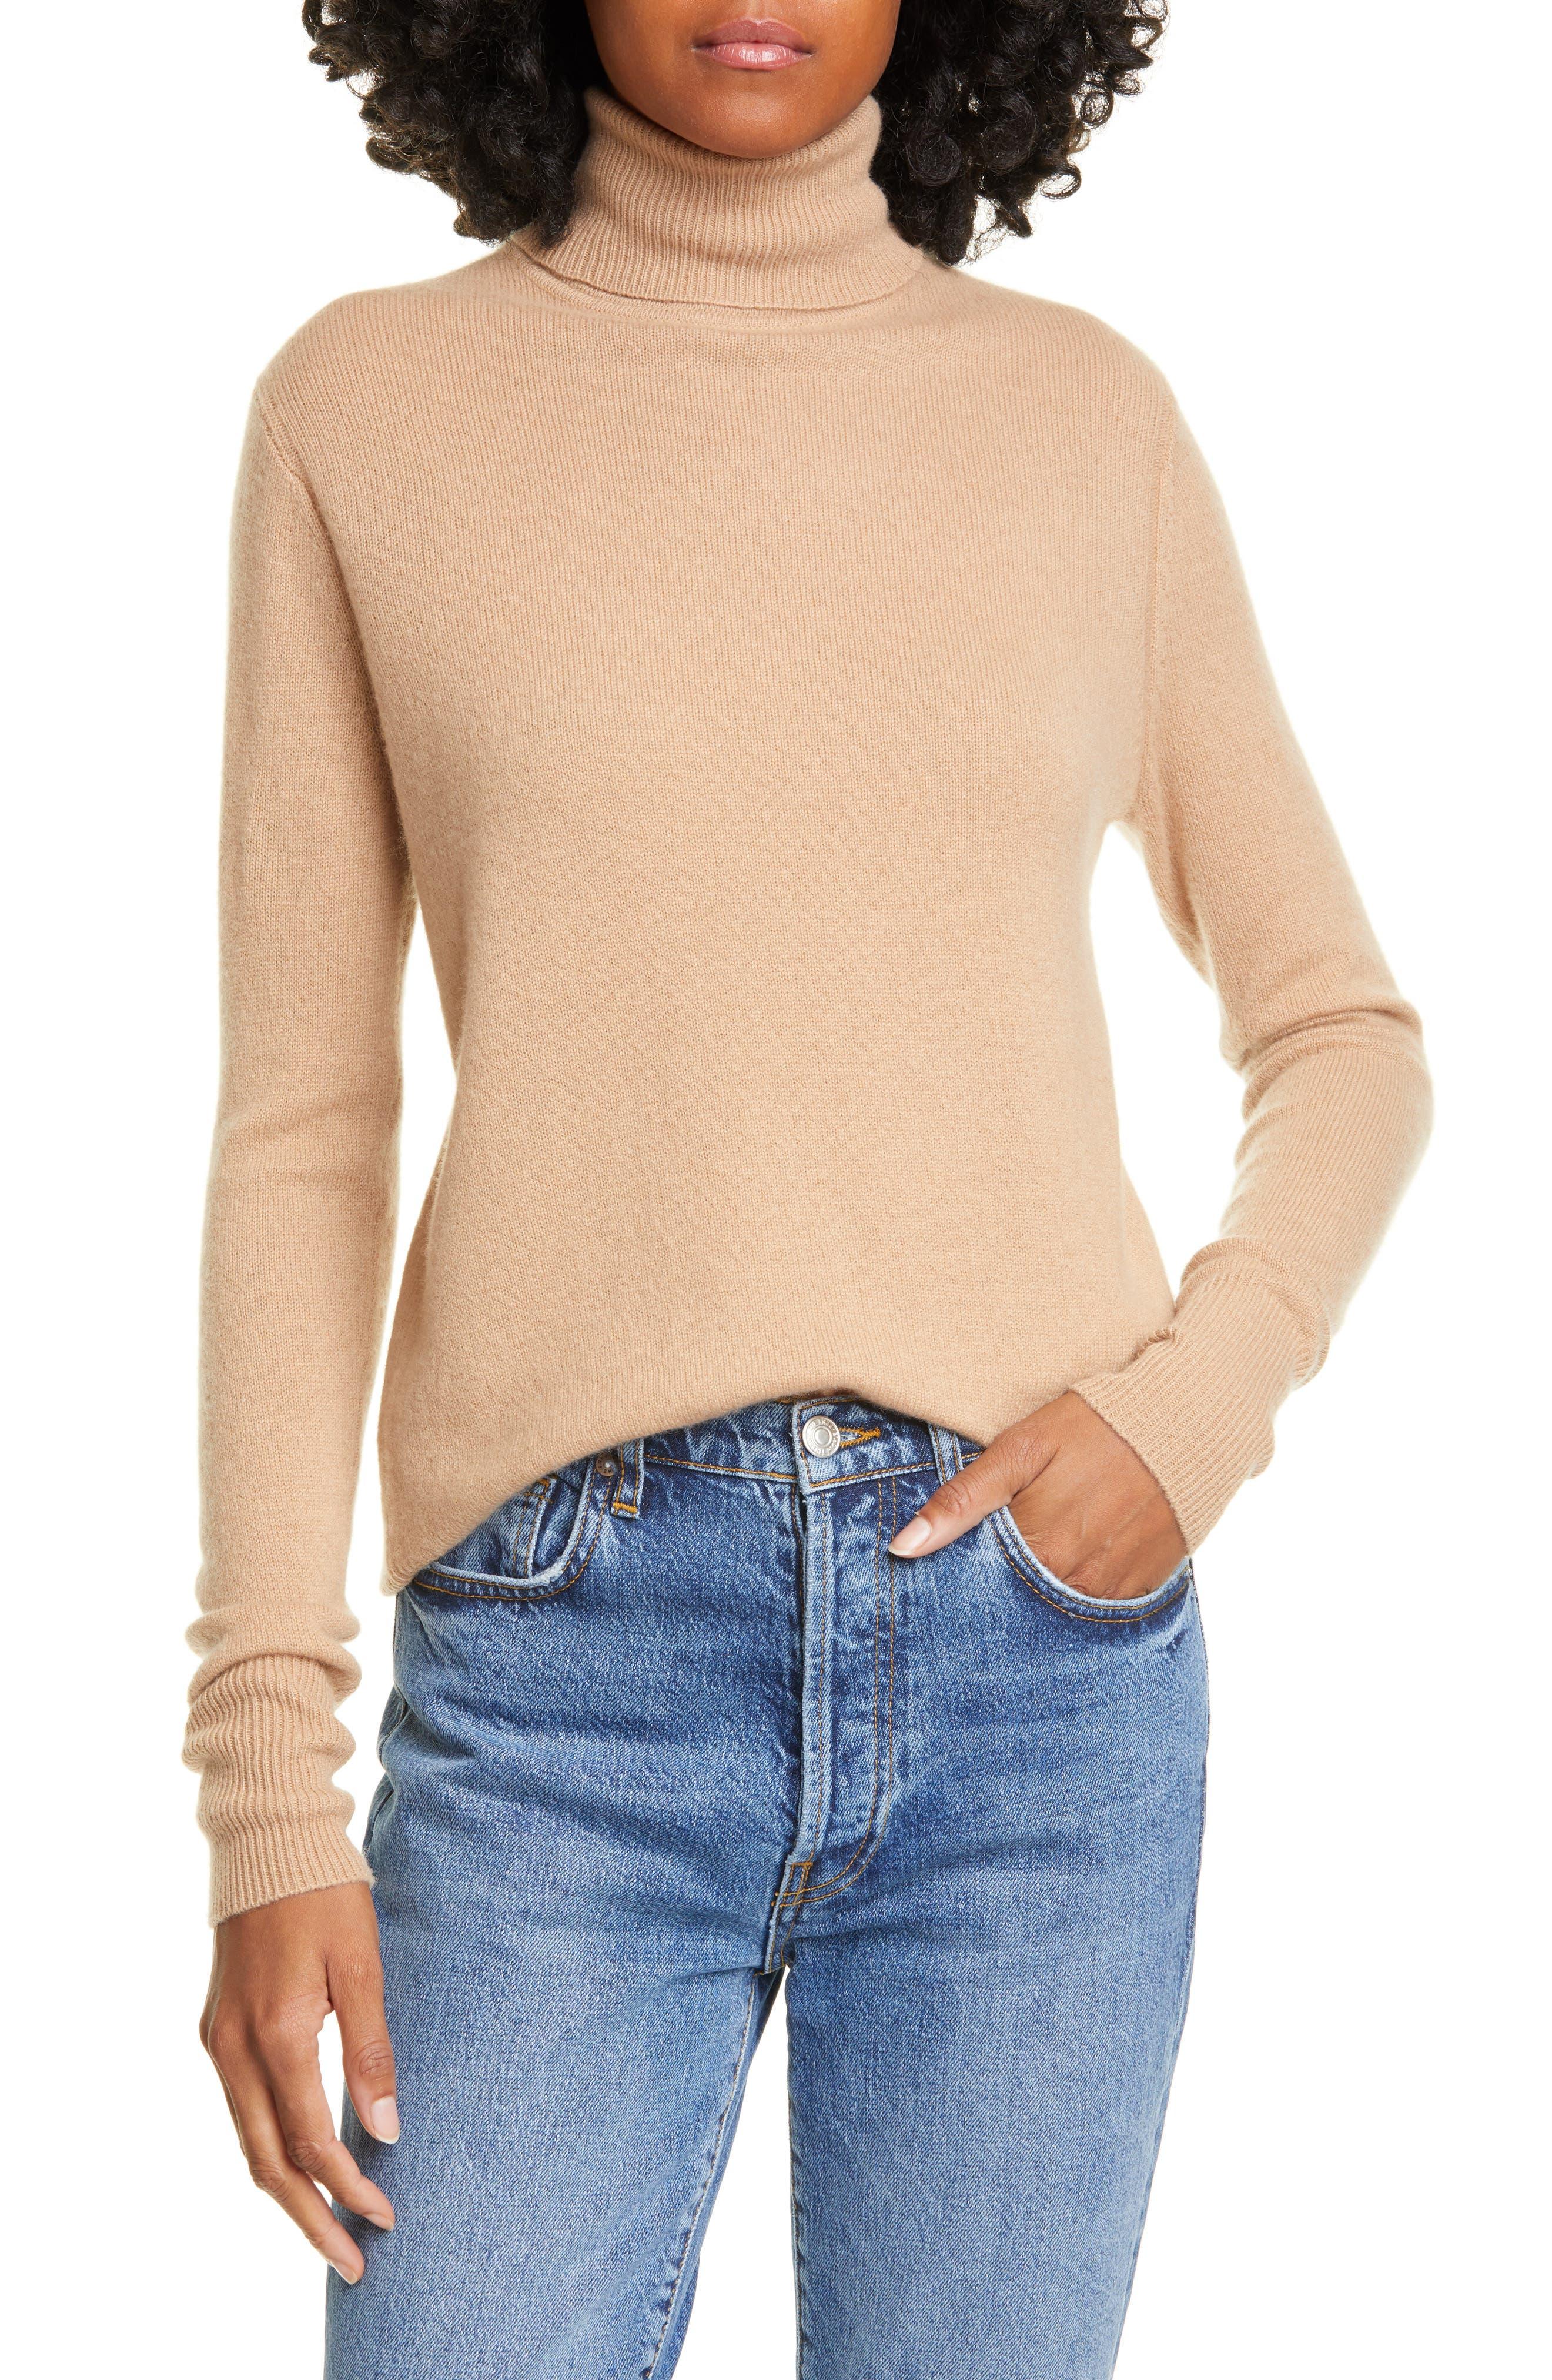 Equipment Tops Delafine Cashmere Turtleneck Sweater